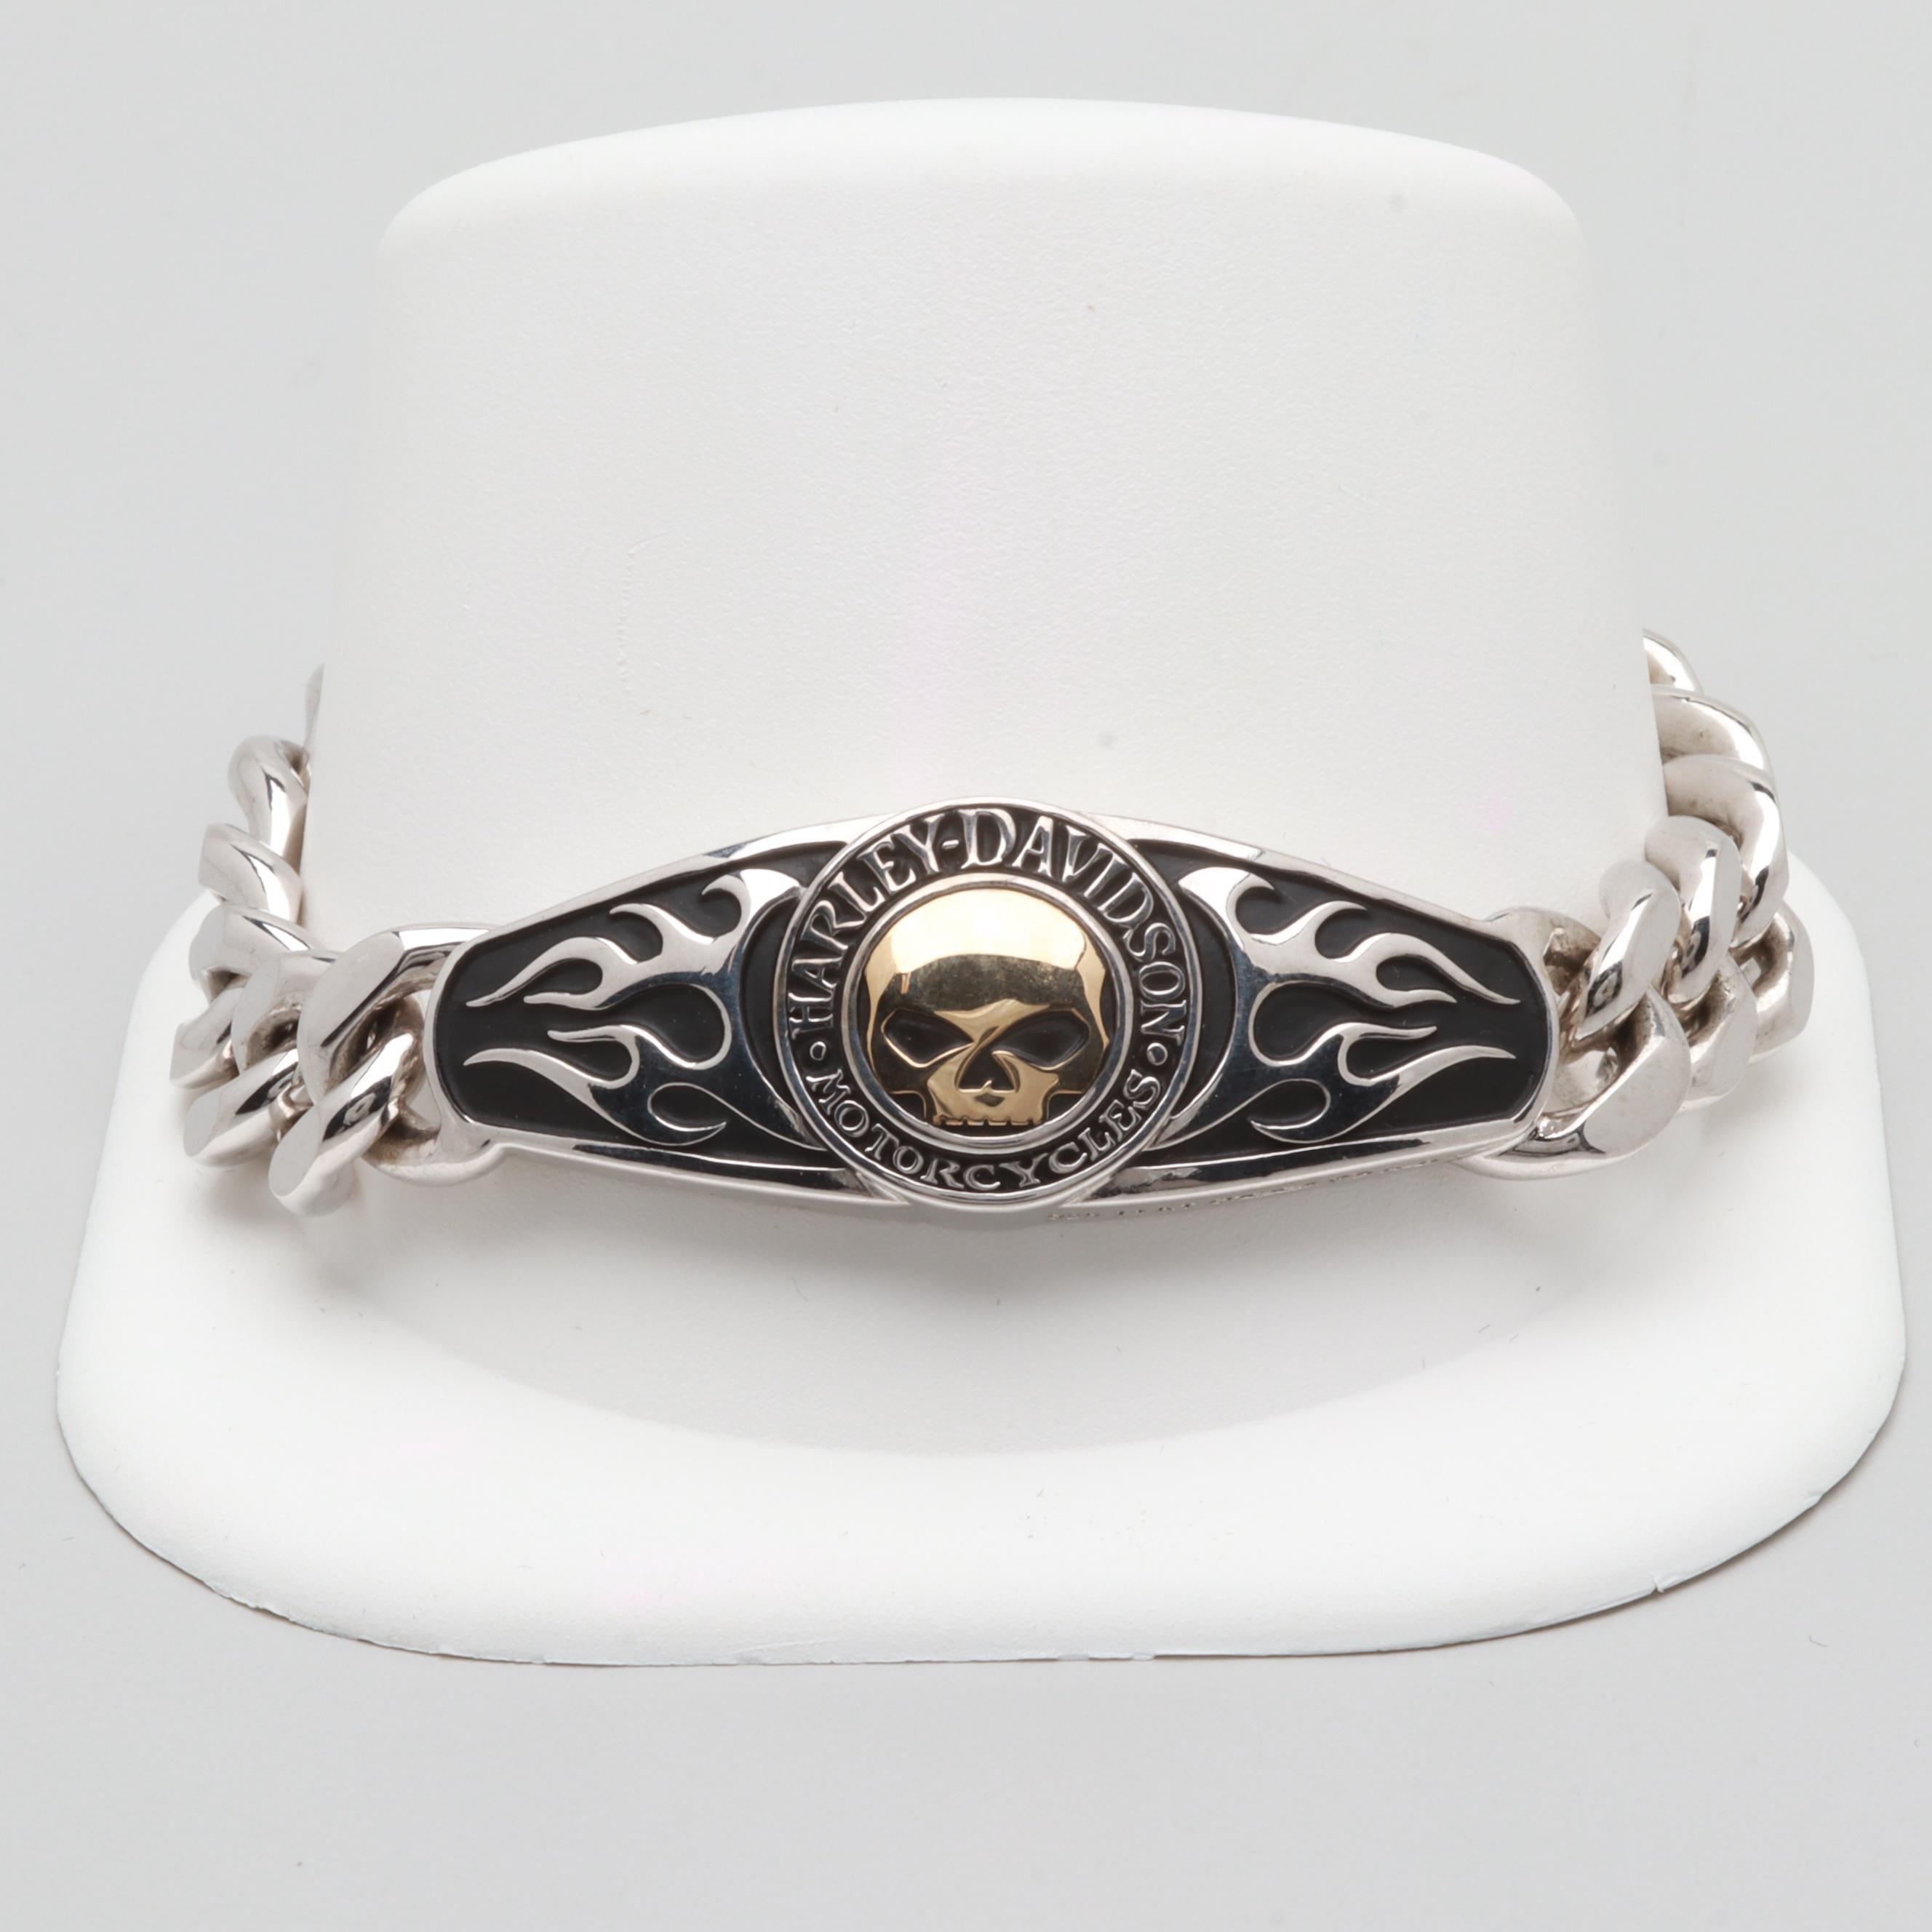 Harley Davidson Sterling Silver & 14K Yellow Gold Bracelet